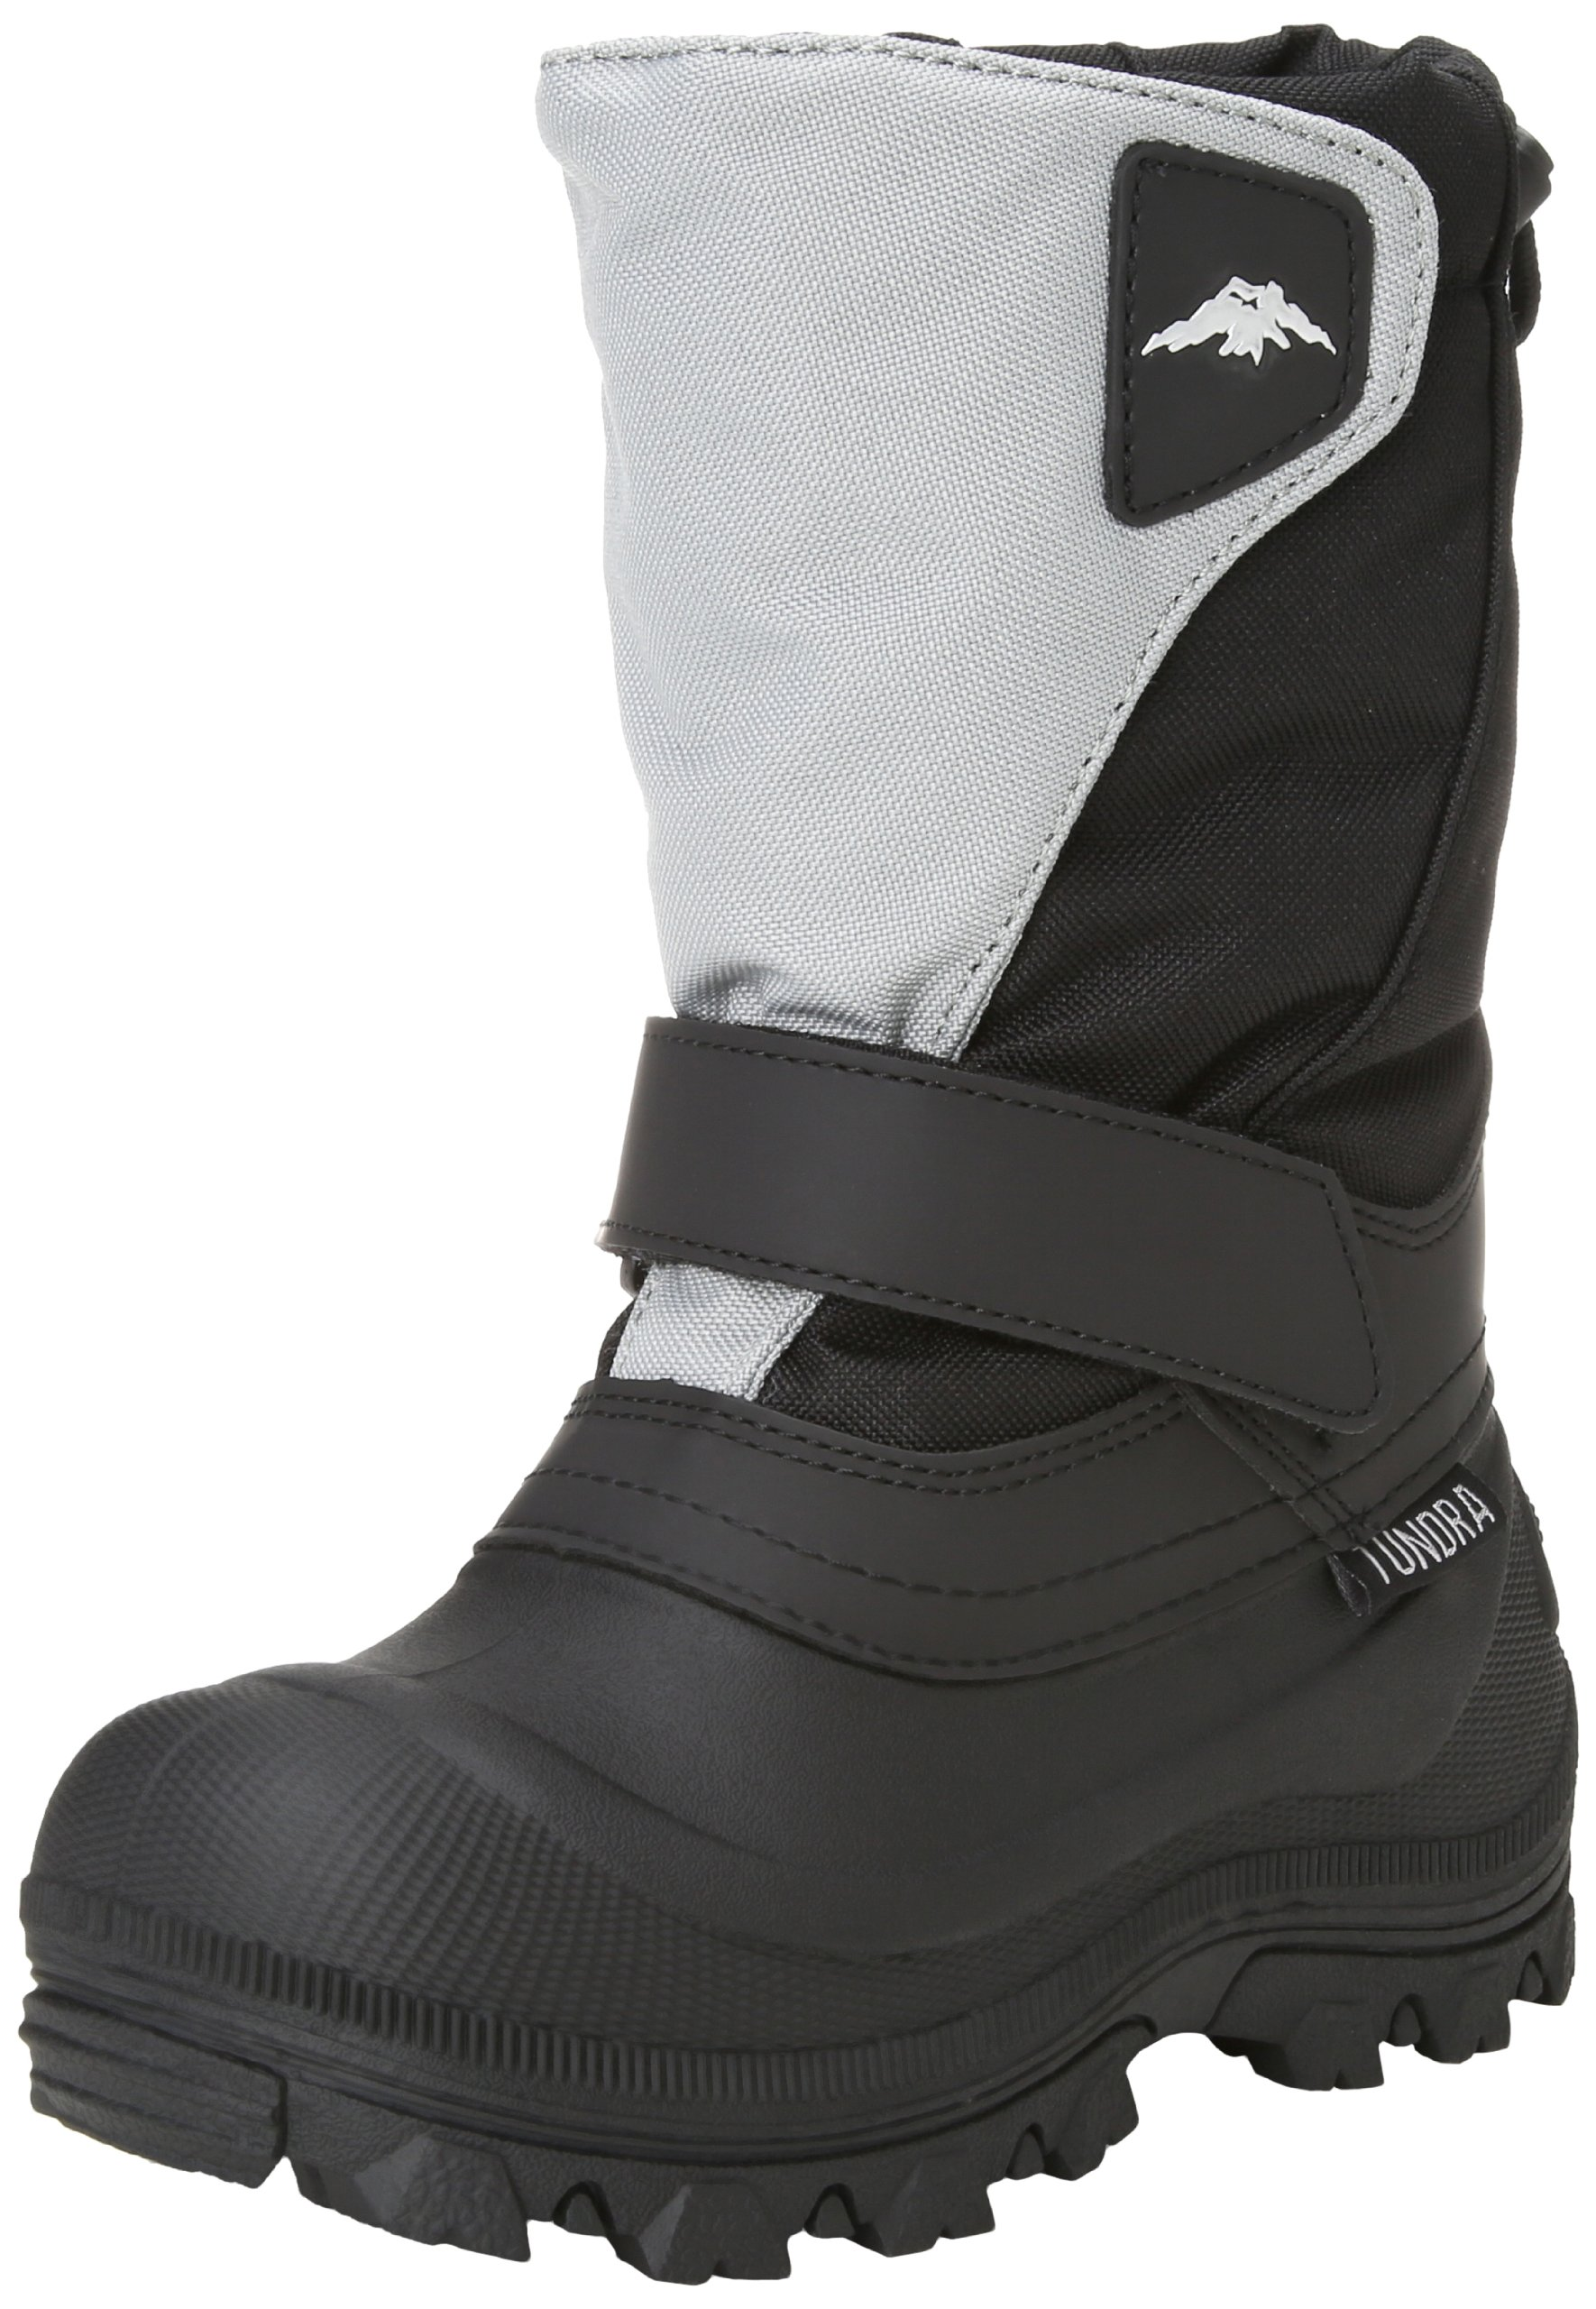 Tundra Quebec 2 Wide Boot (Toddler/Little Kid/Big Kid),Black/Grey,2 W US Little Kid